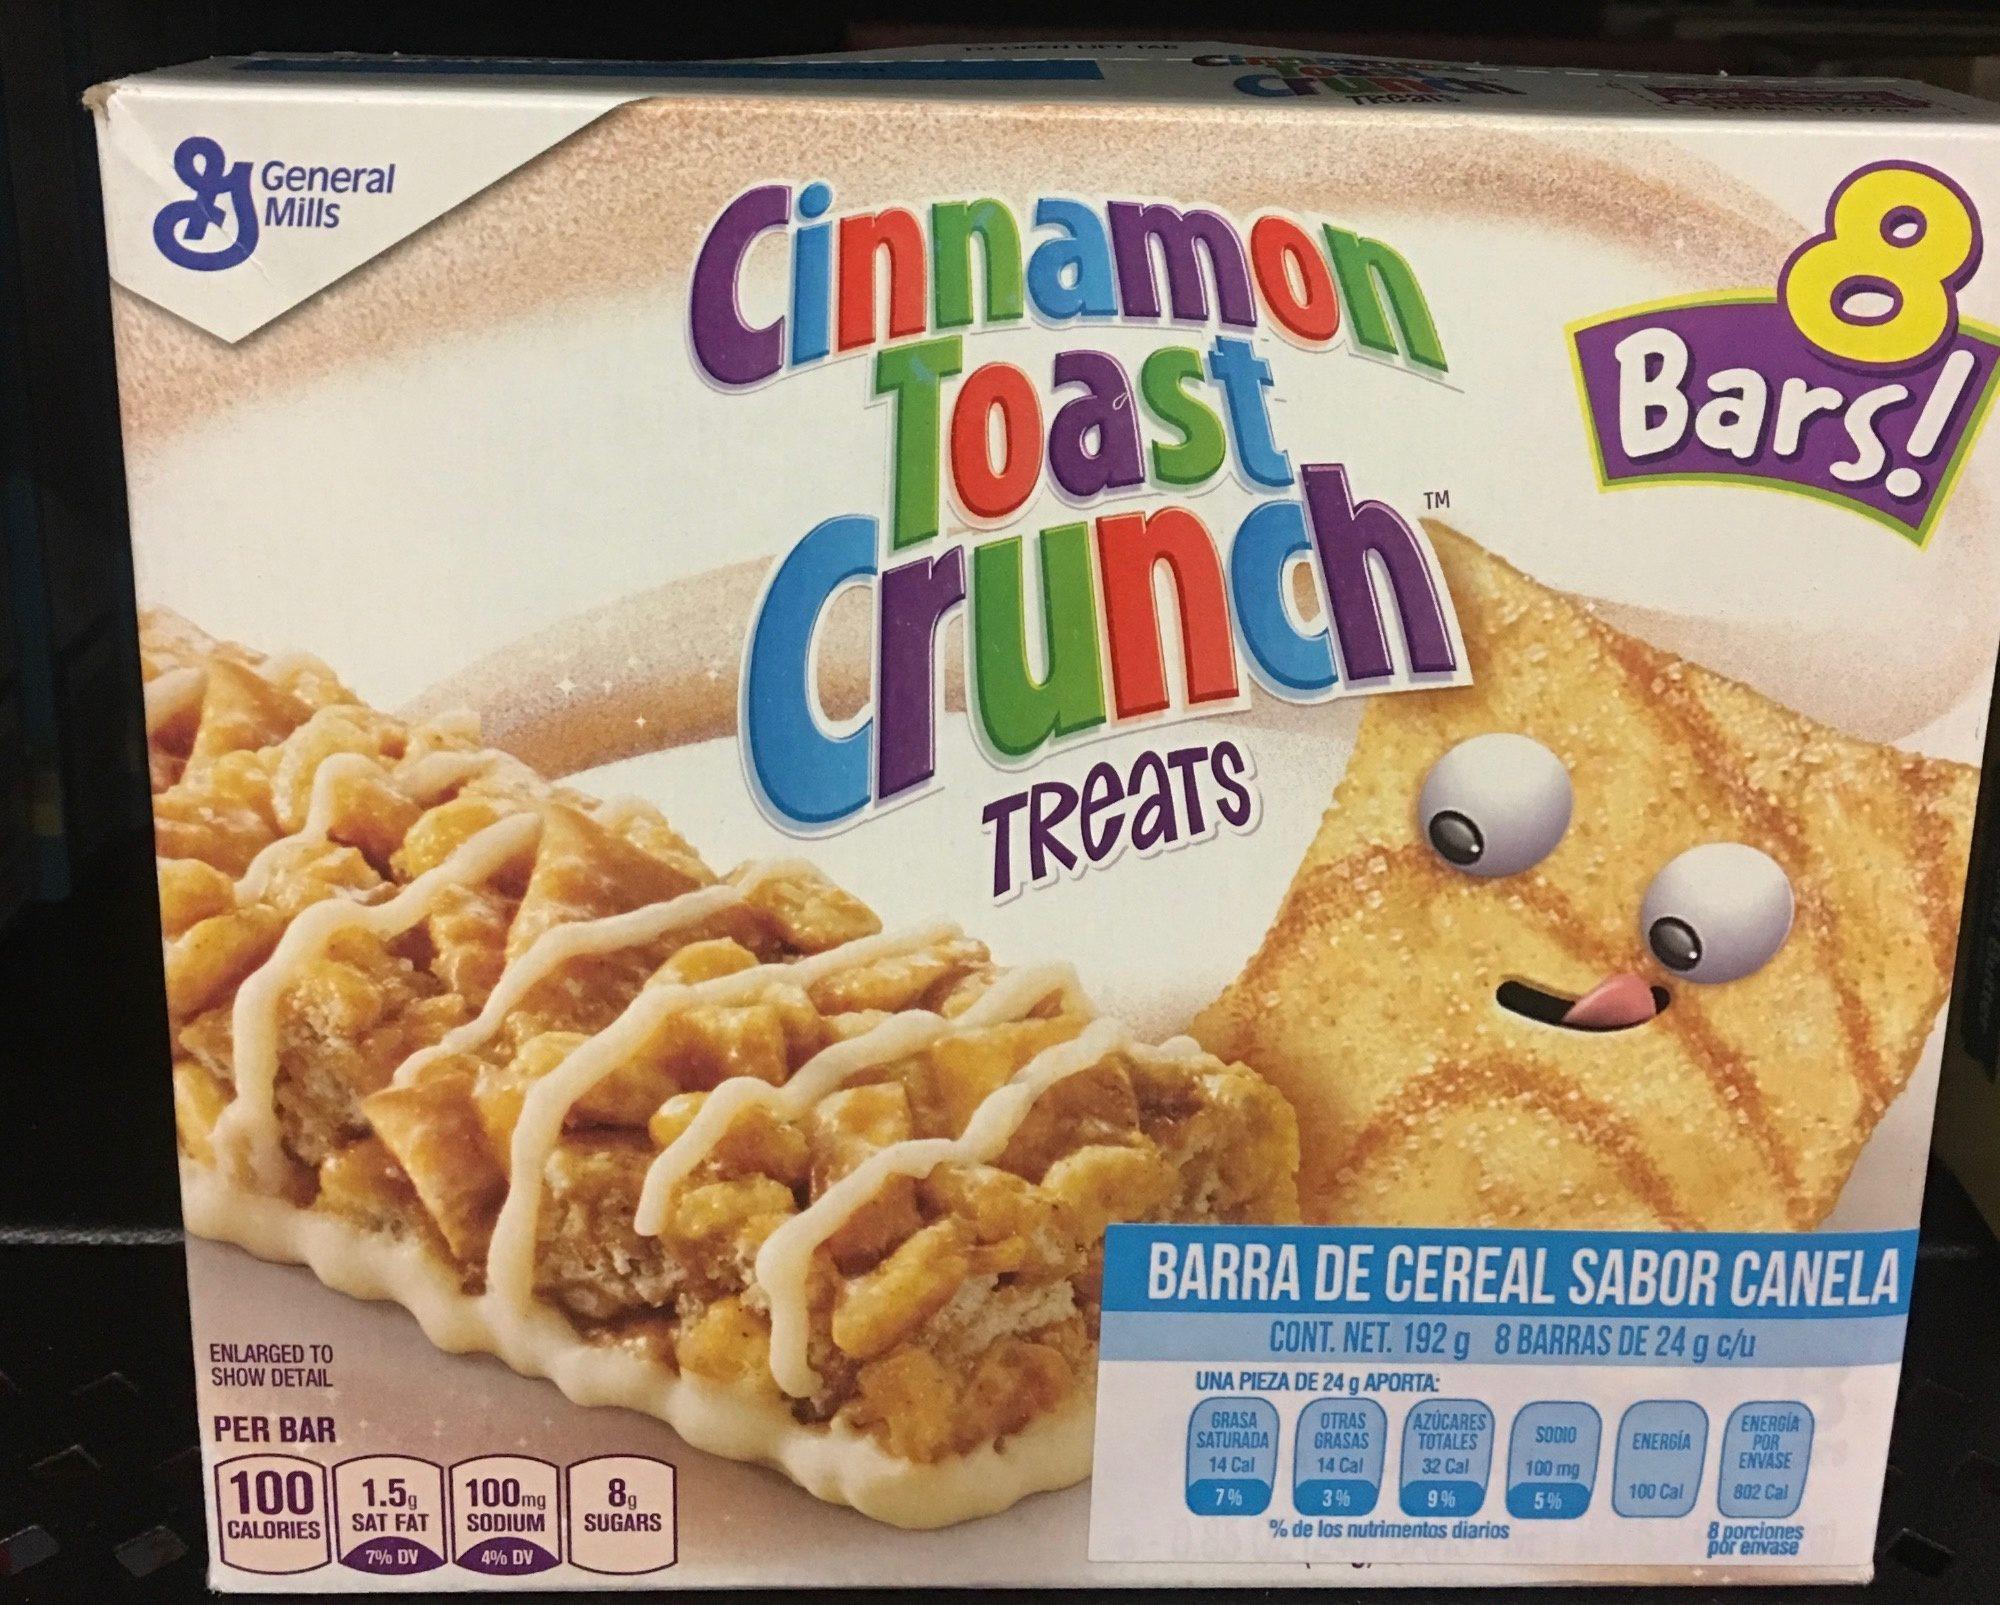 Cinnamon Toast Crunch Treats - Product